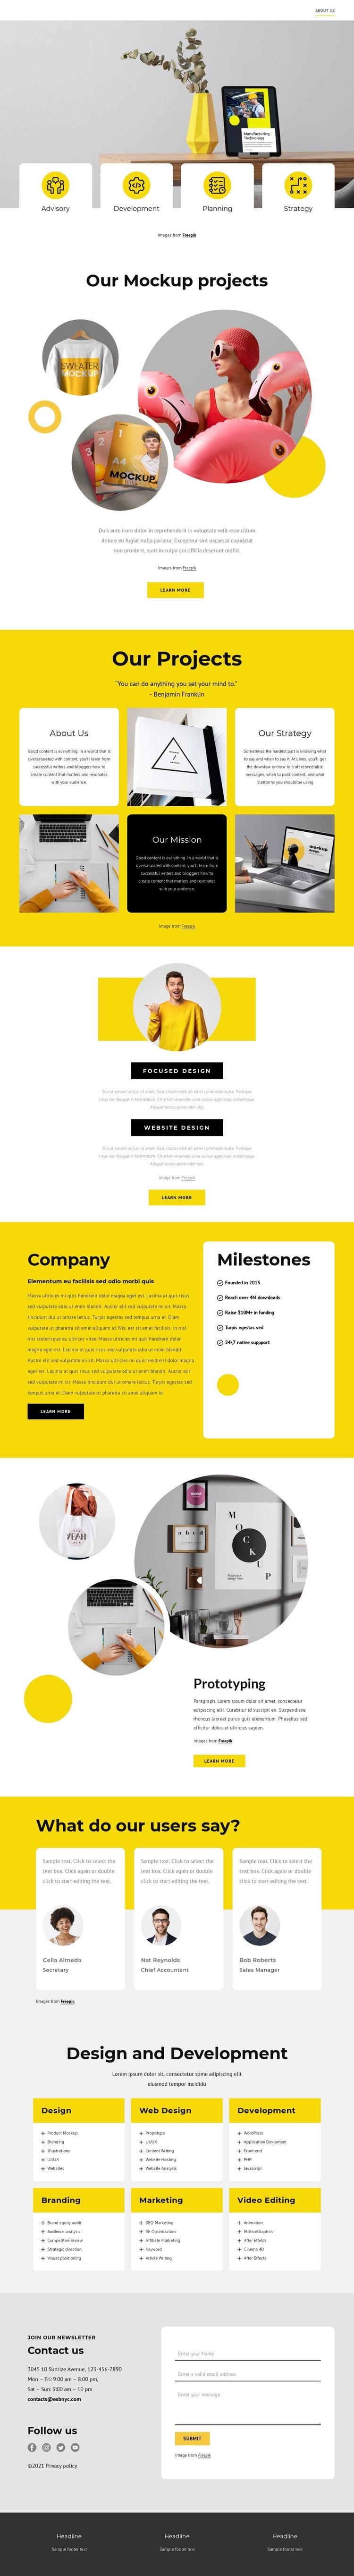 Design and branding studio Html Code Example